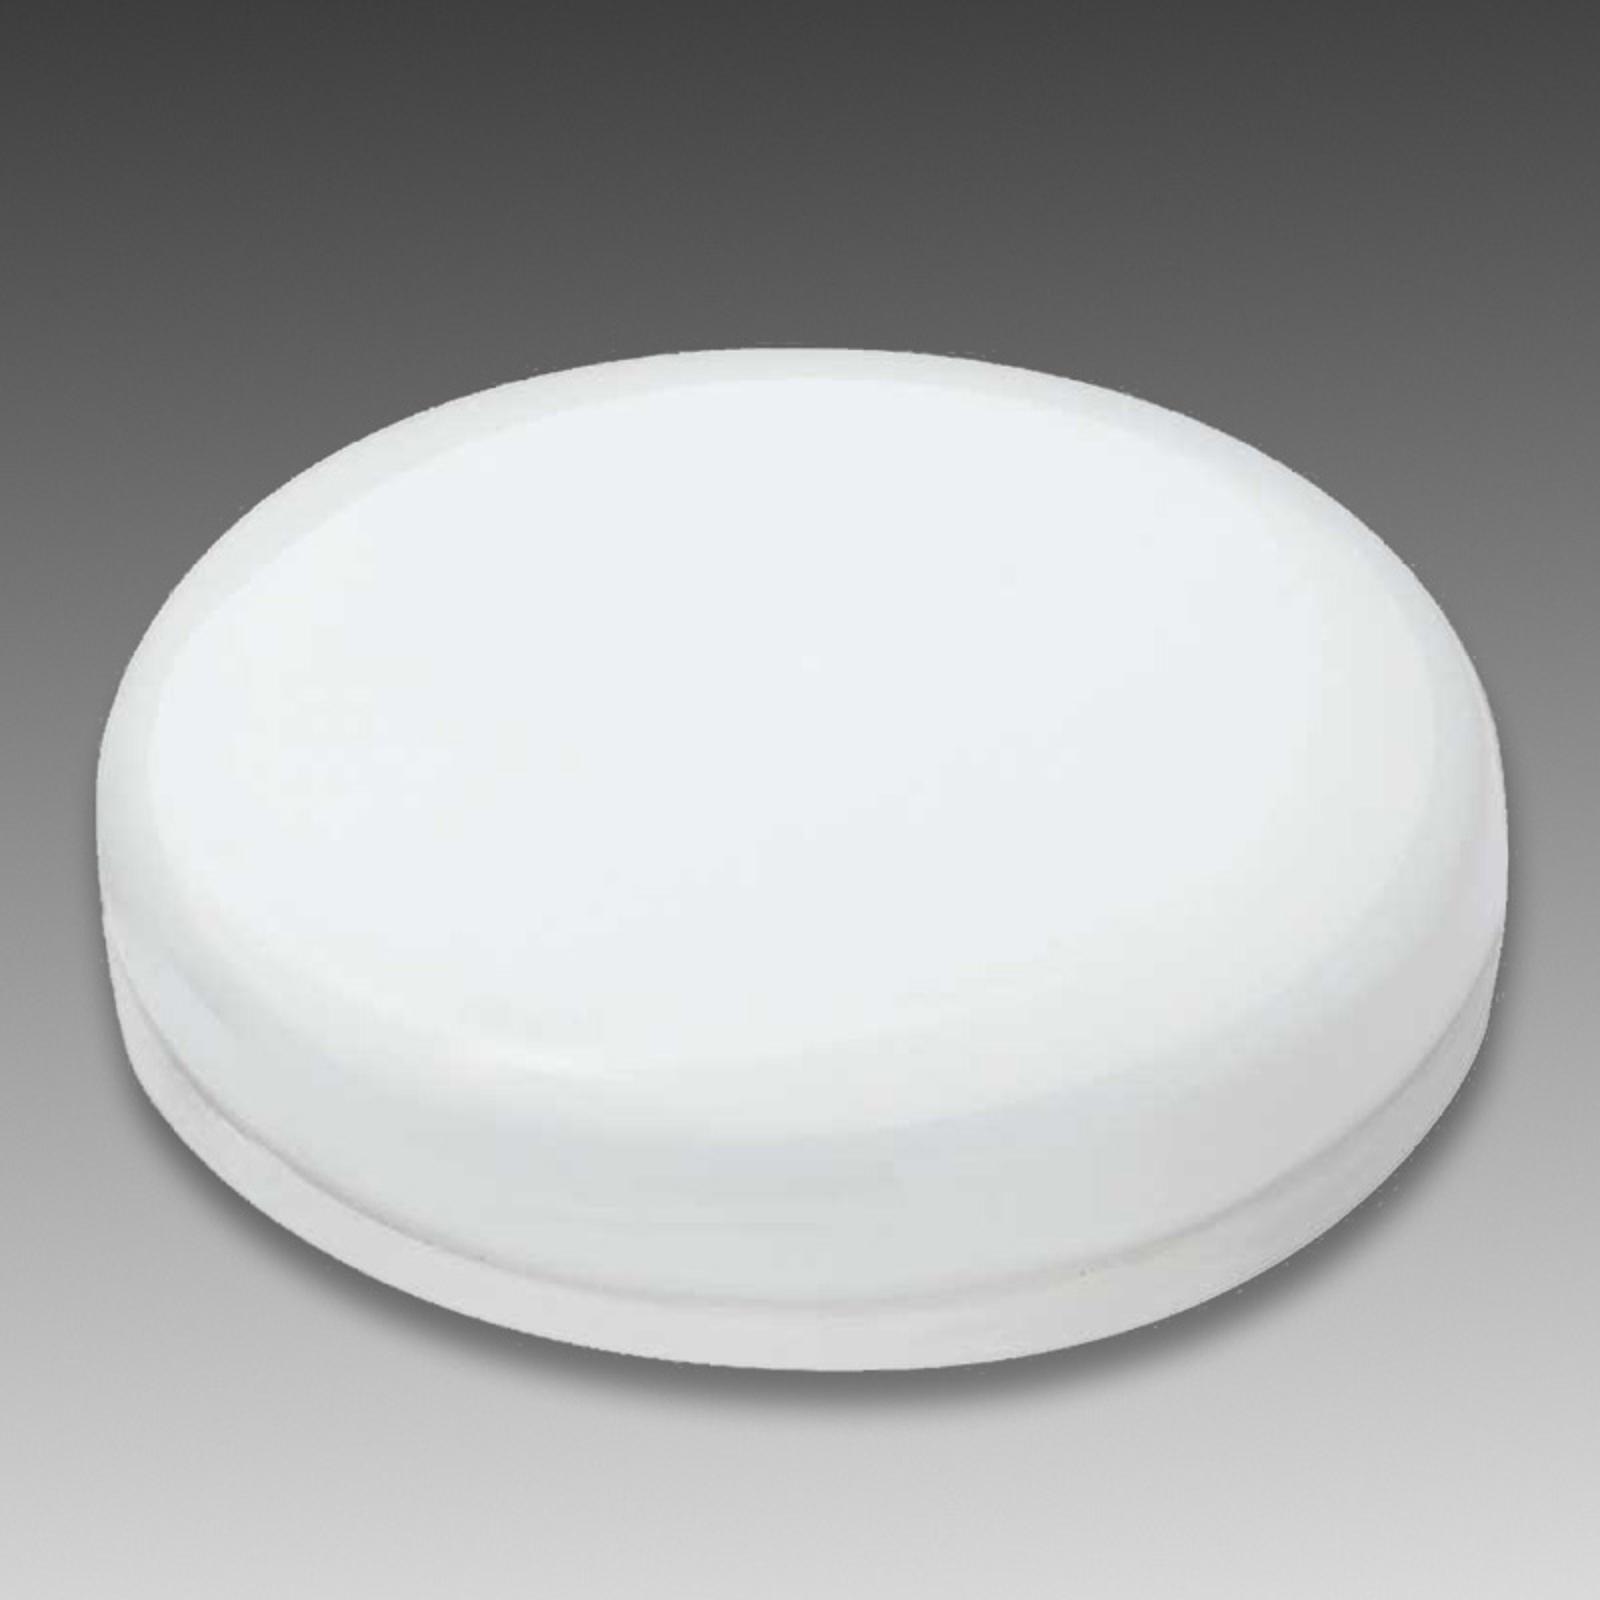 GX53 5W 828 LED-Leuchtmittel, dimmbar